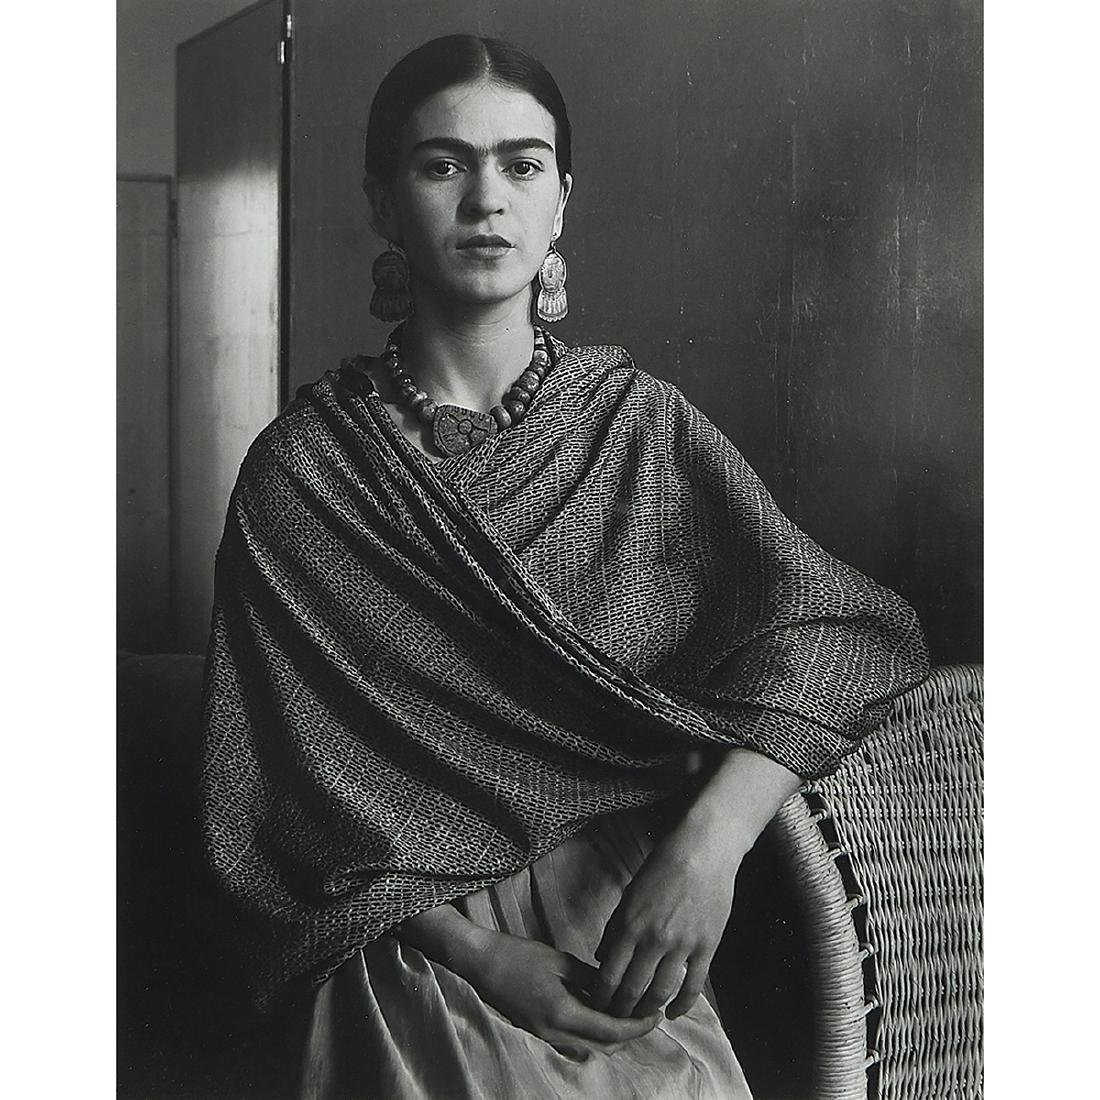 Imogen Cunningham, Frida Kahlo Rivera